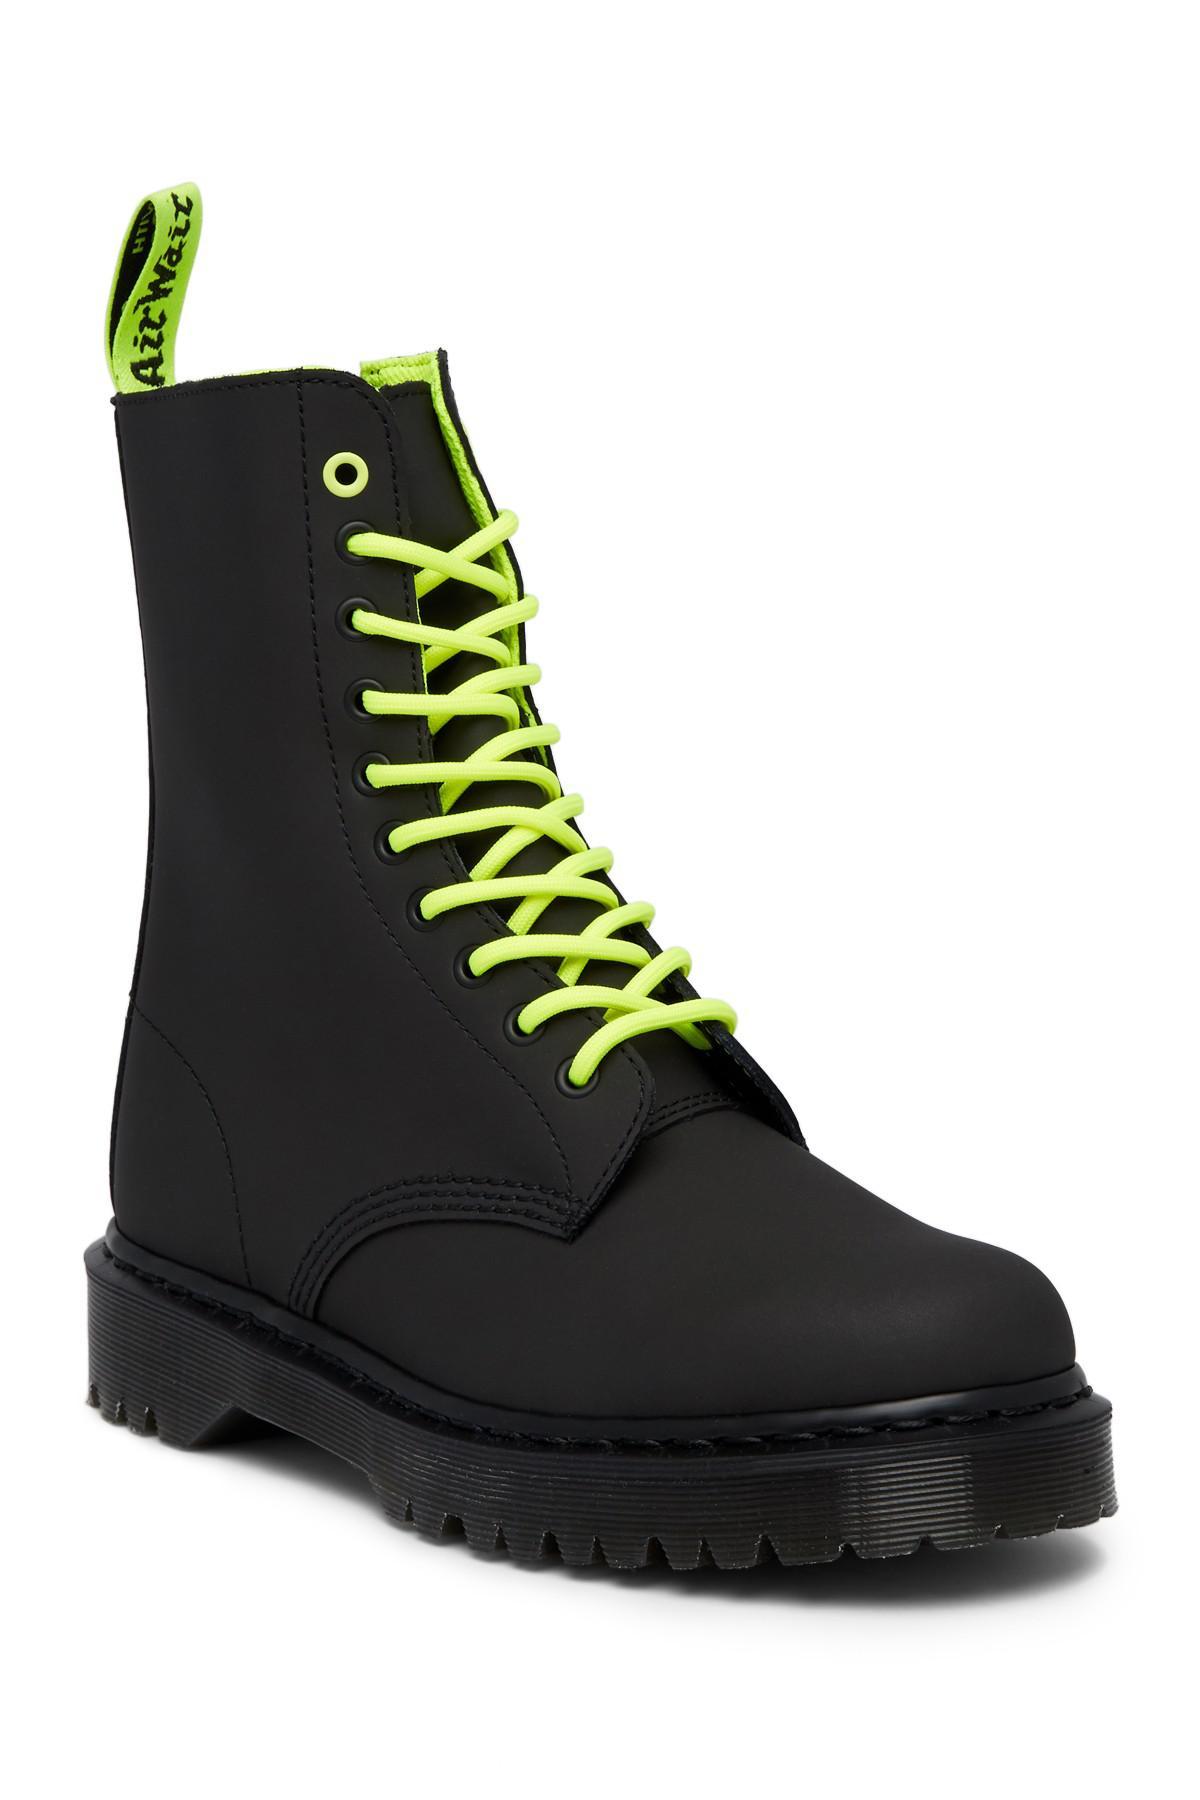 bb38372918f Dr. Martens. Men s Black 1490 Alt Boot.  160  90 From Nordstrom Rack